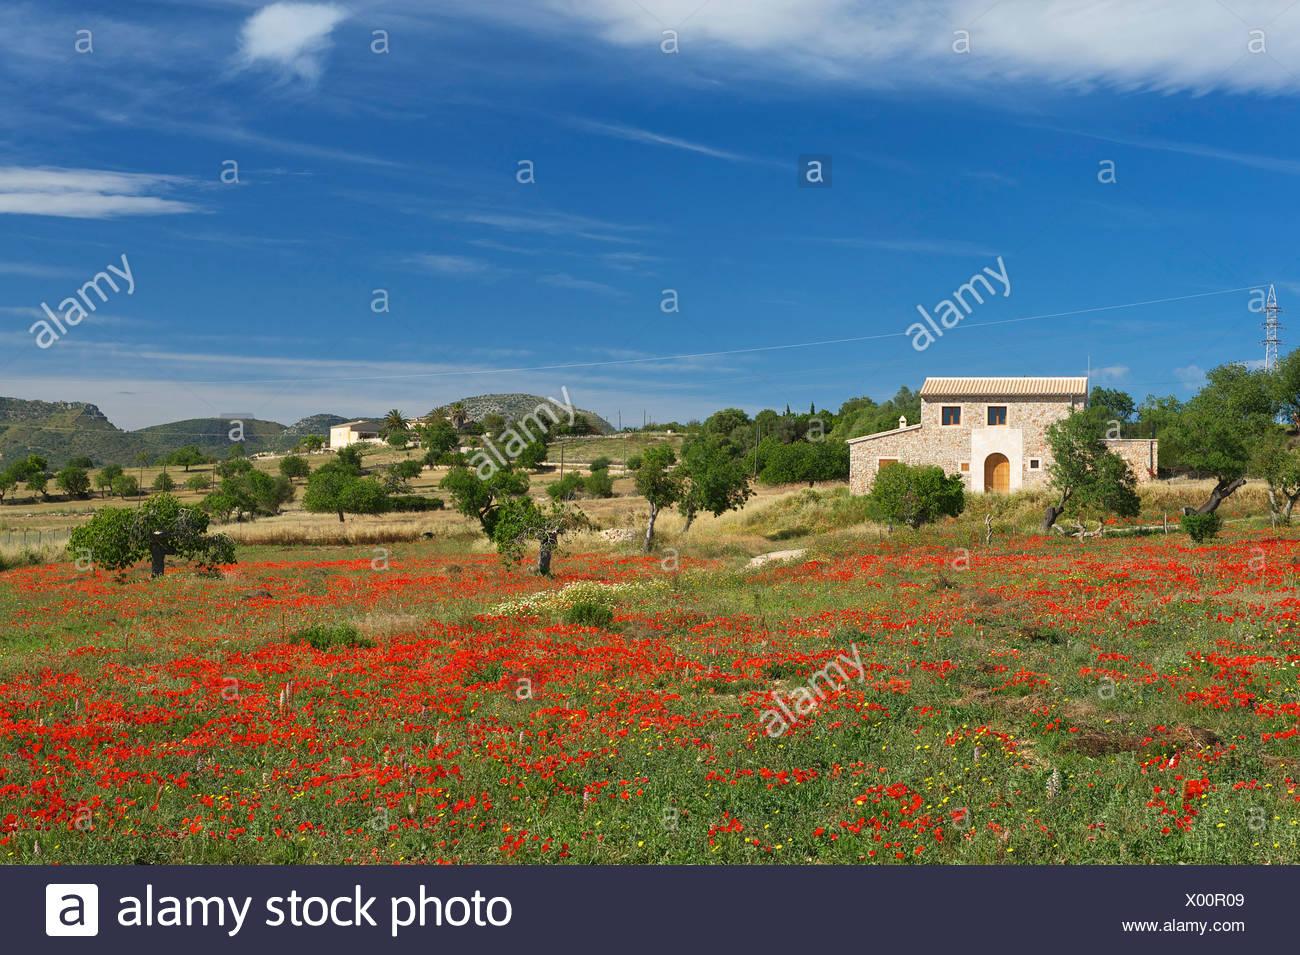 Balearic Islands, Majorca, Mallorca, Spain, Europe, outside, Finca, Fincas, country house, country houses, poppy blossom, scener - Stock Image